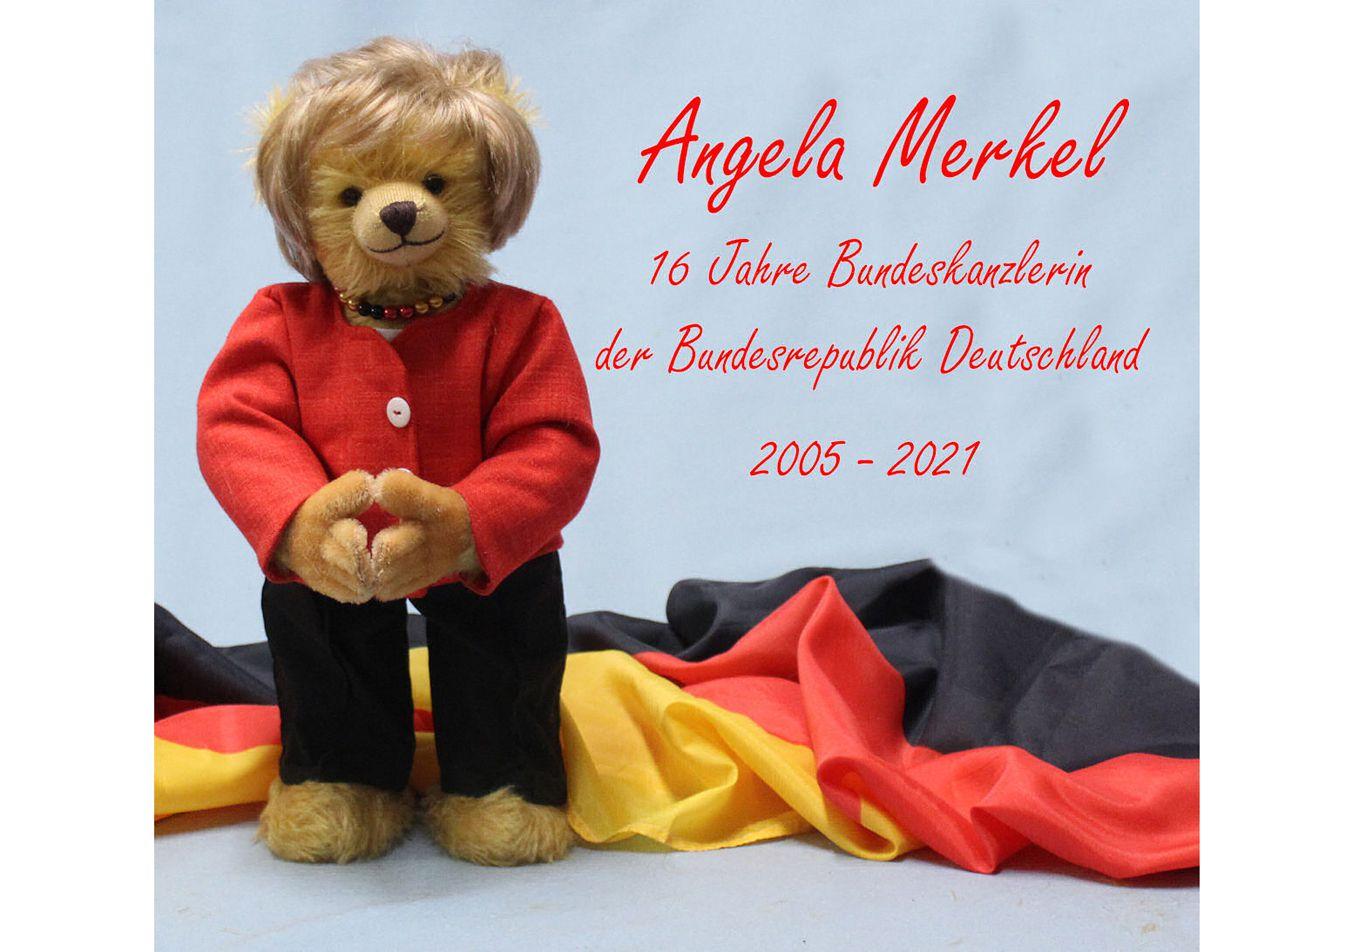 Німеччина: плюшева канцлерка